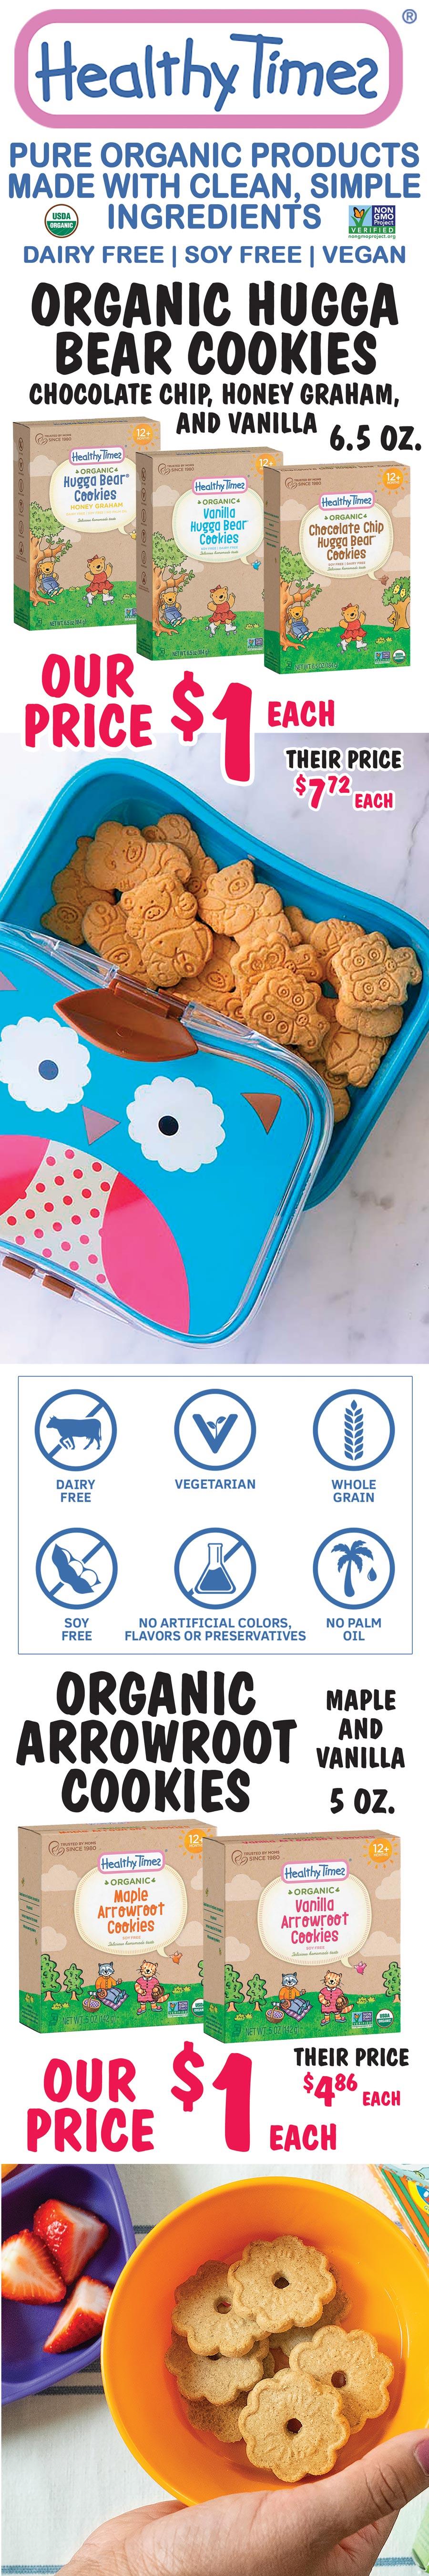 Healthy Times Organic Cookies - $1 per box - 5 Flavors